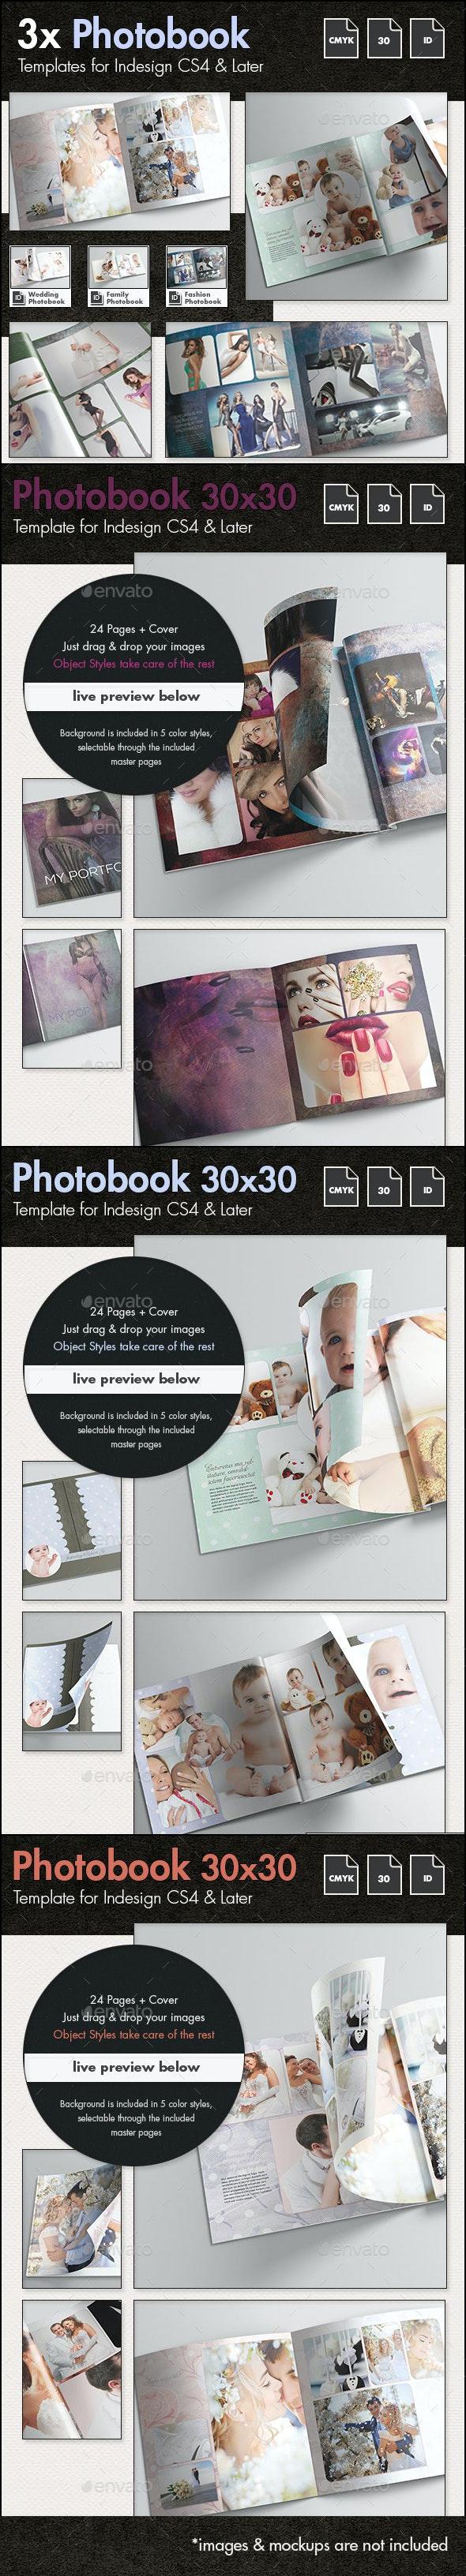 3x Photobook Album Template Bundle - Photo Albums Print Templates